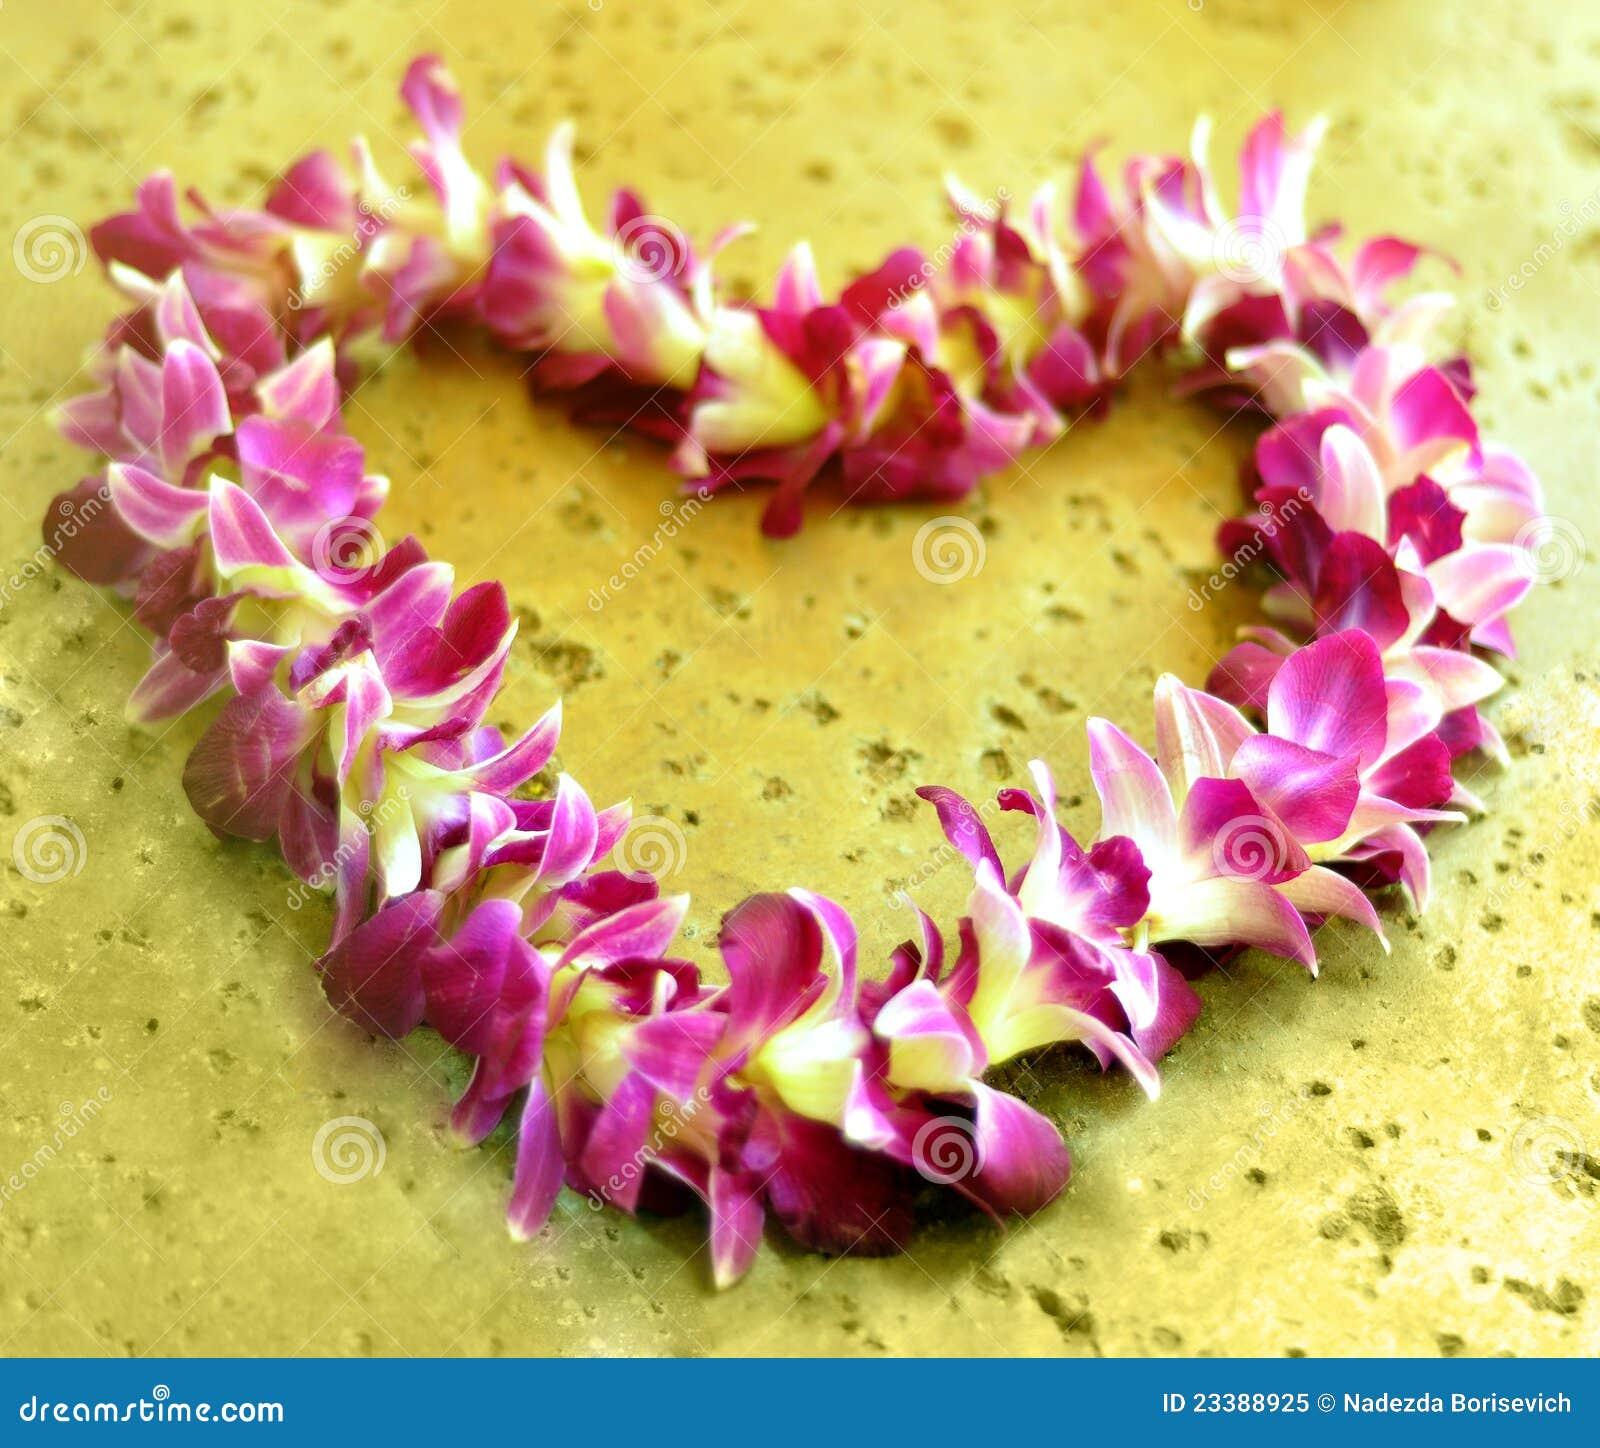 Hawaiian lei stock image image of garland flower hawaiian 4244353 hawaiian lei royalty free stock photo izmirmasajfo Image collections